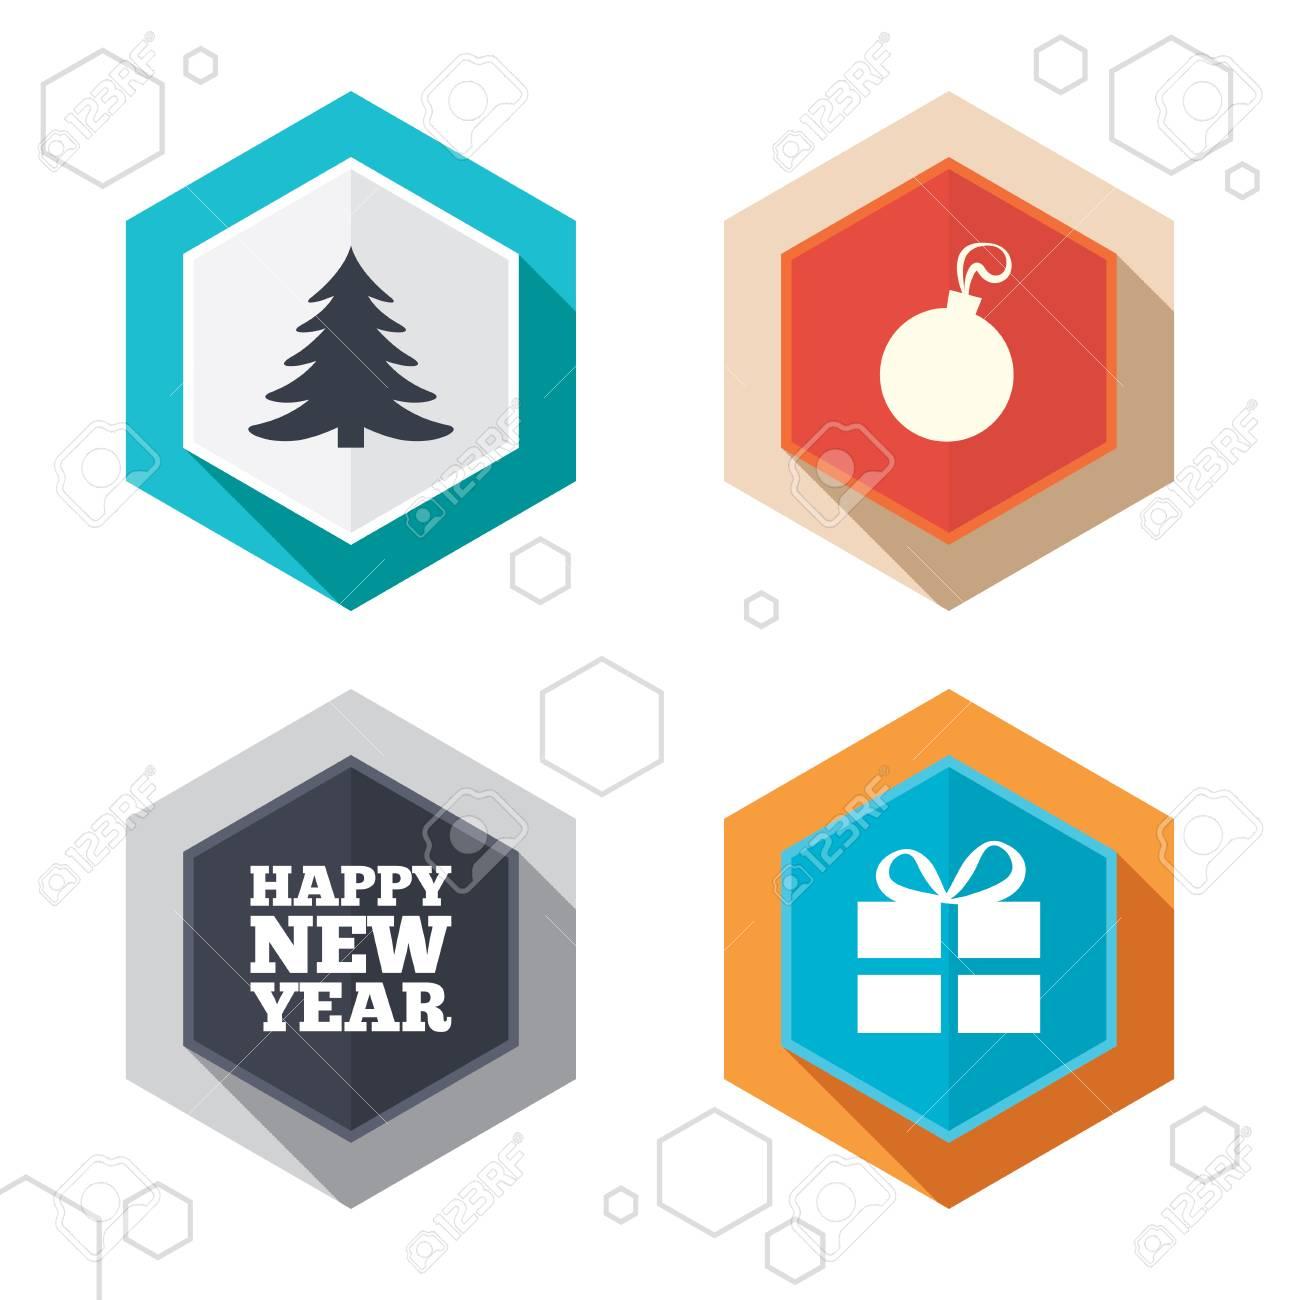 happy new year icon christmas tree and gift box sign symbols